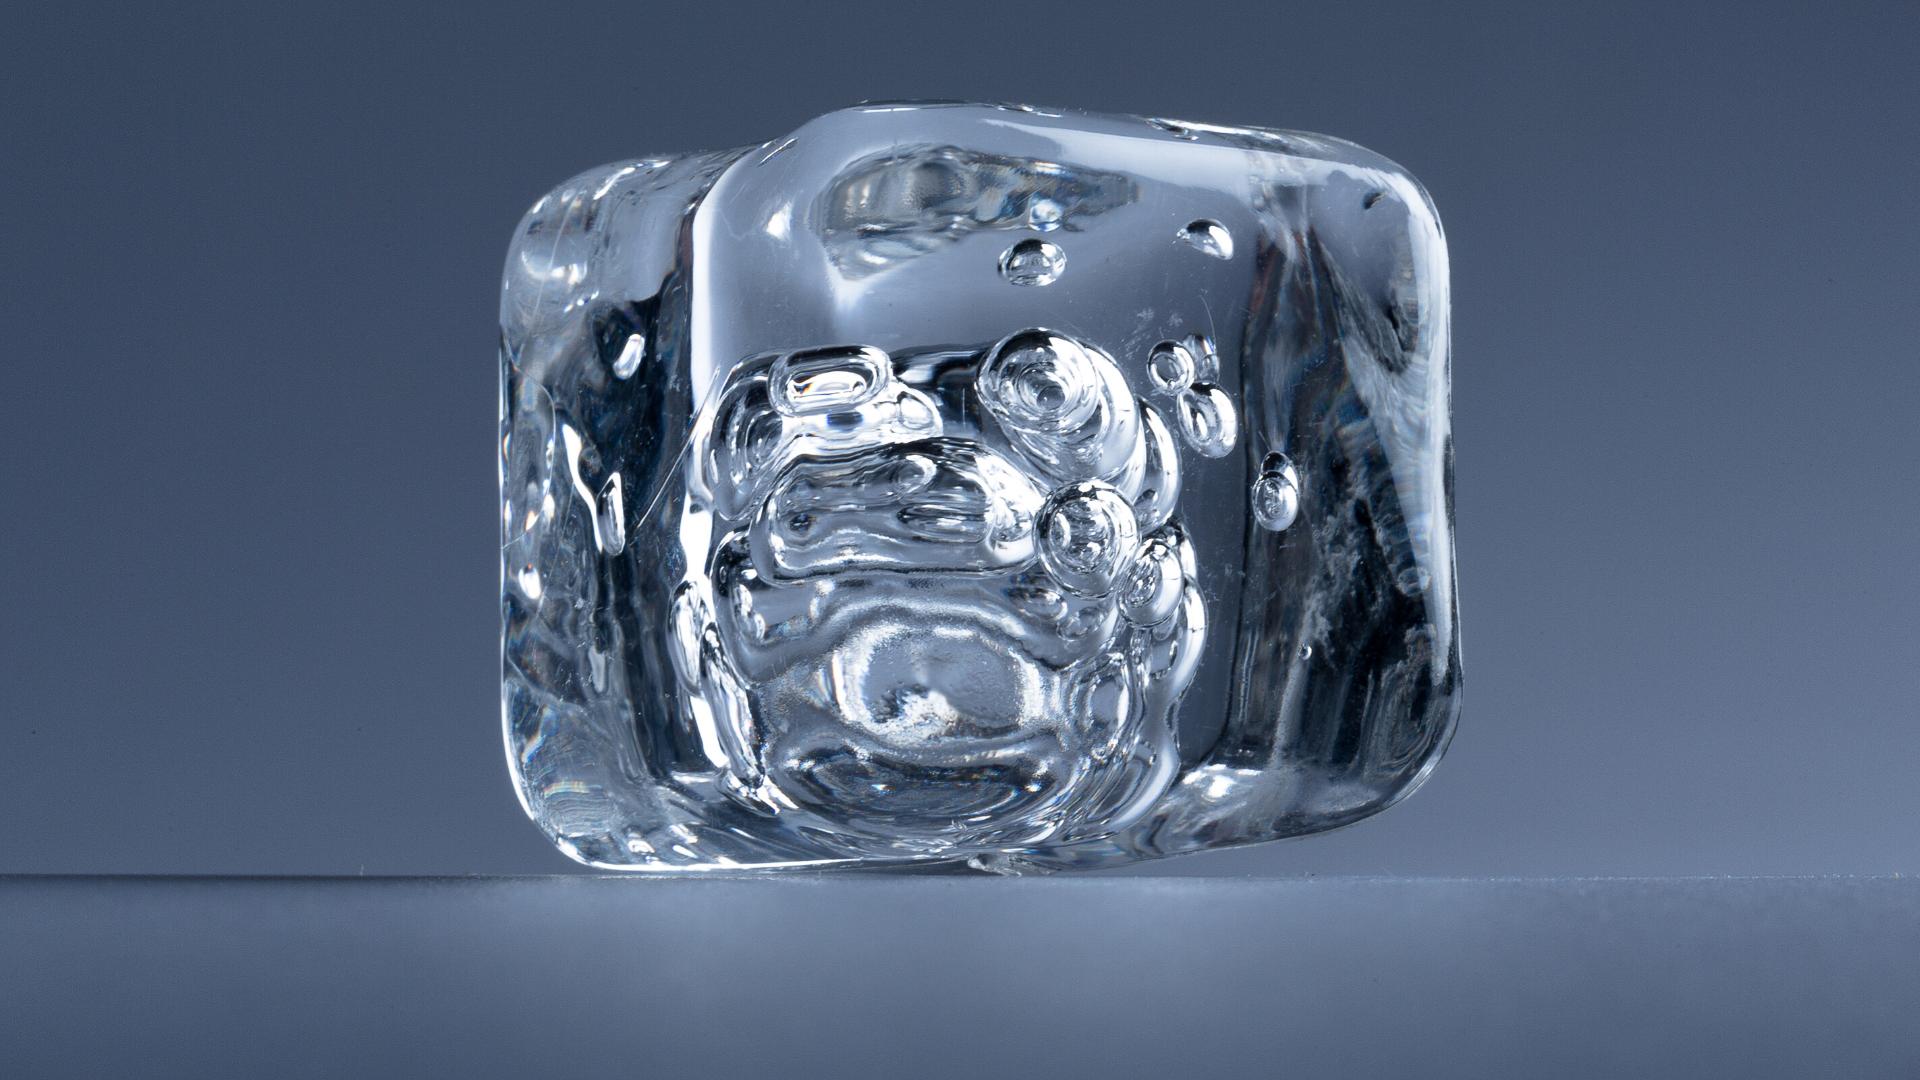 Ice Sanitation FAQs